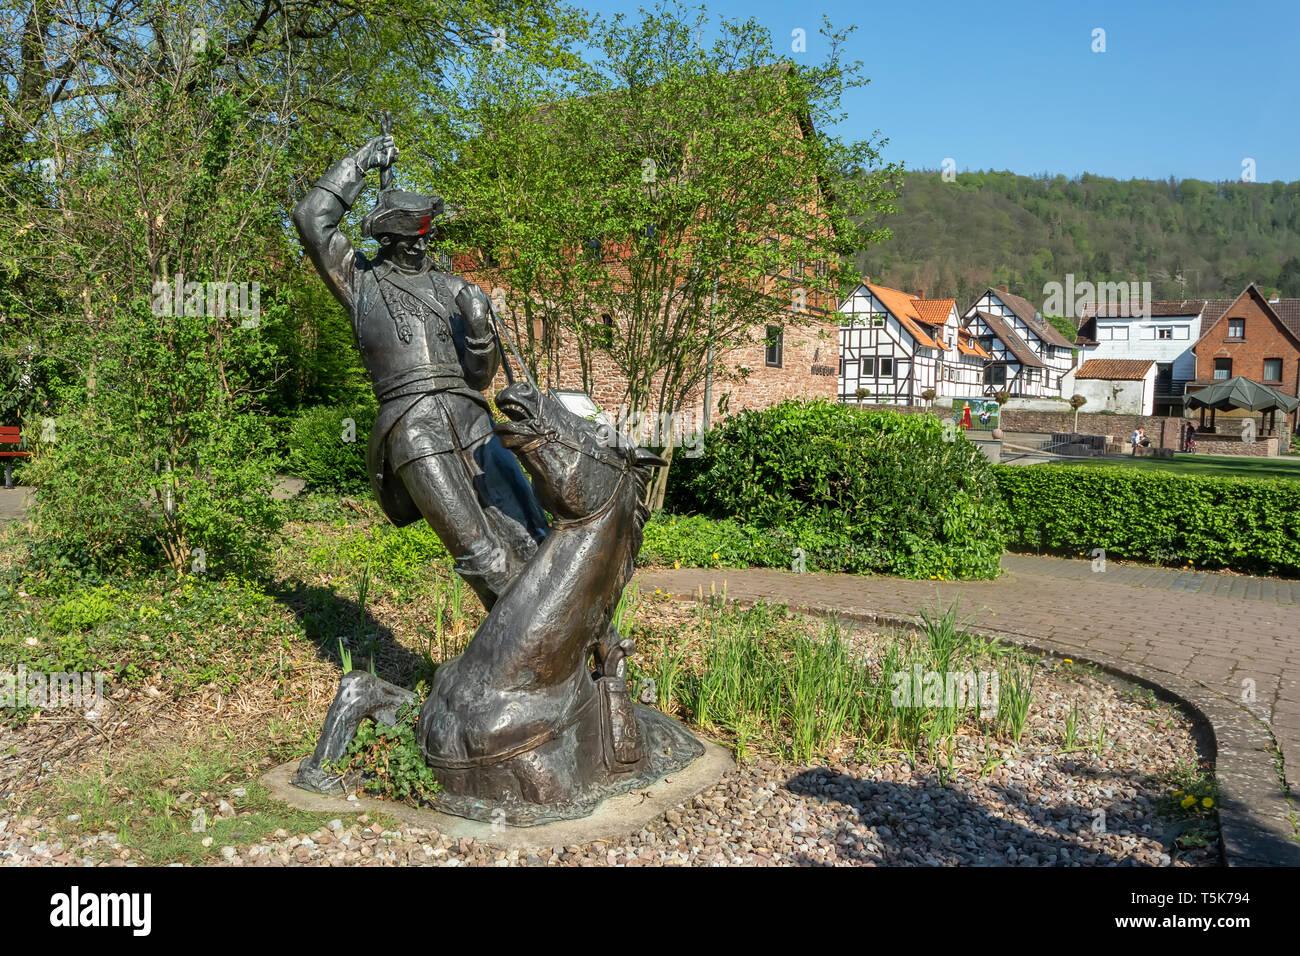 Bodenwerder, Alemania, 21/04/2019: la escultura del 'Lügenbaron von Münchhausen' Foto de stock